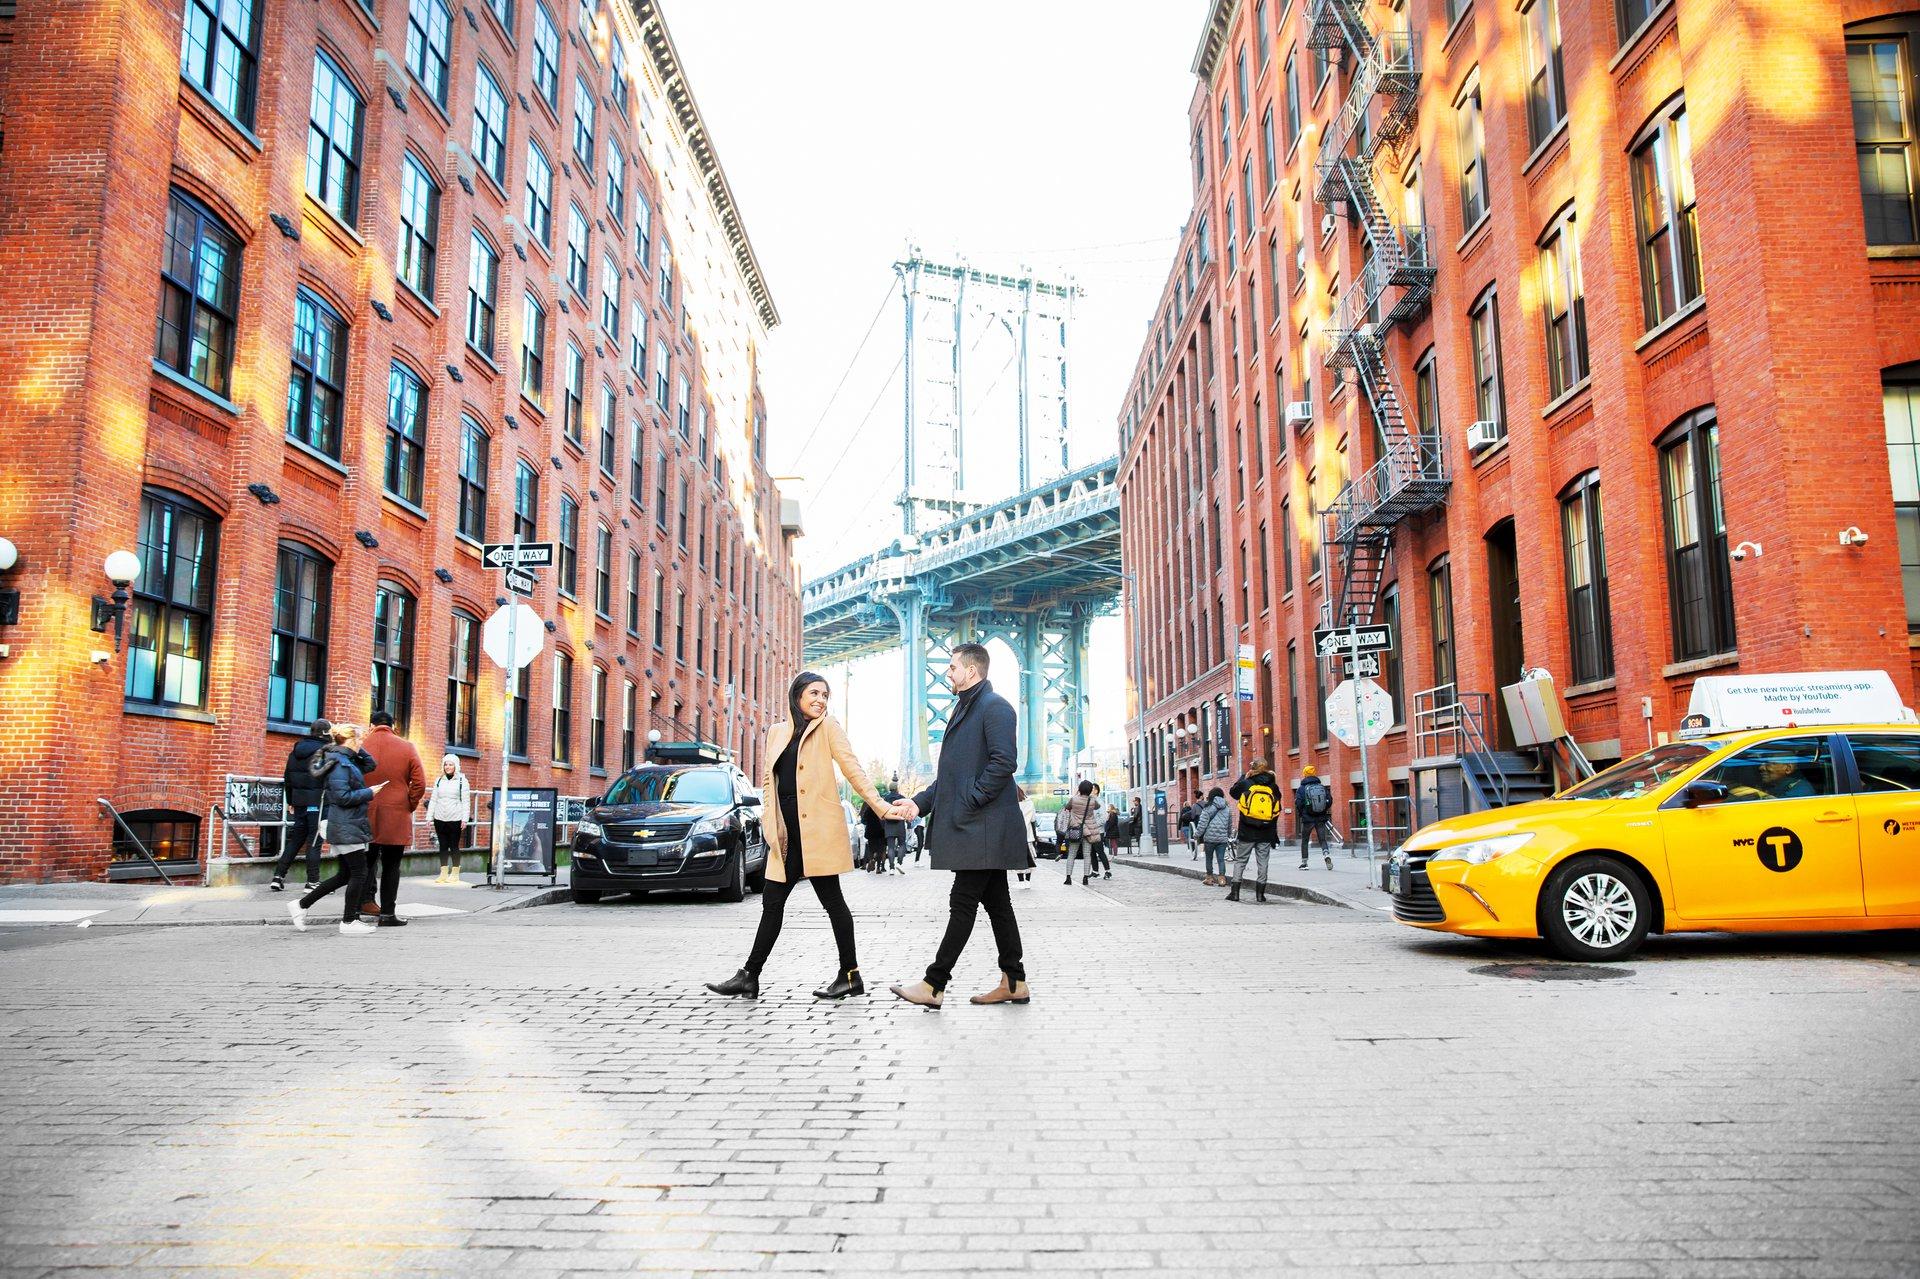 Armando's Portfolio - Image 1